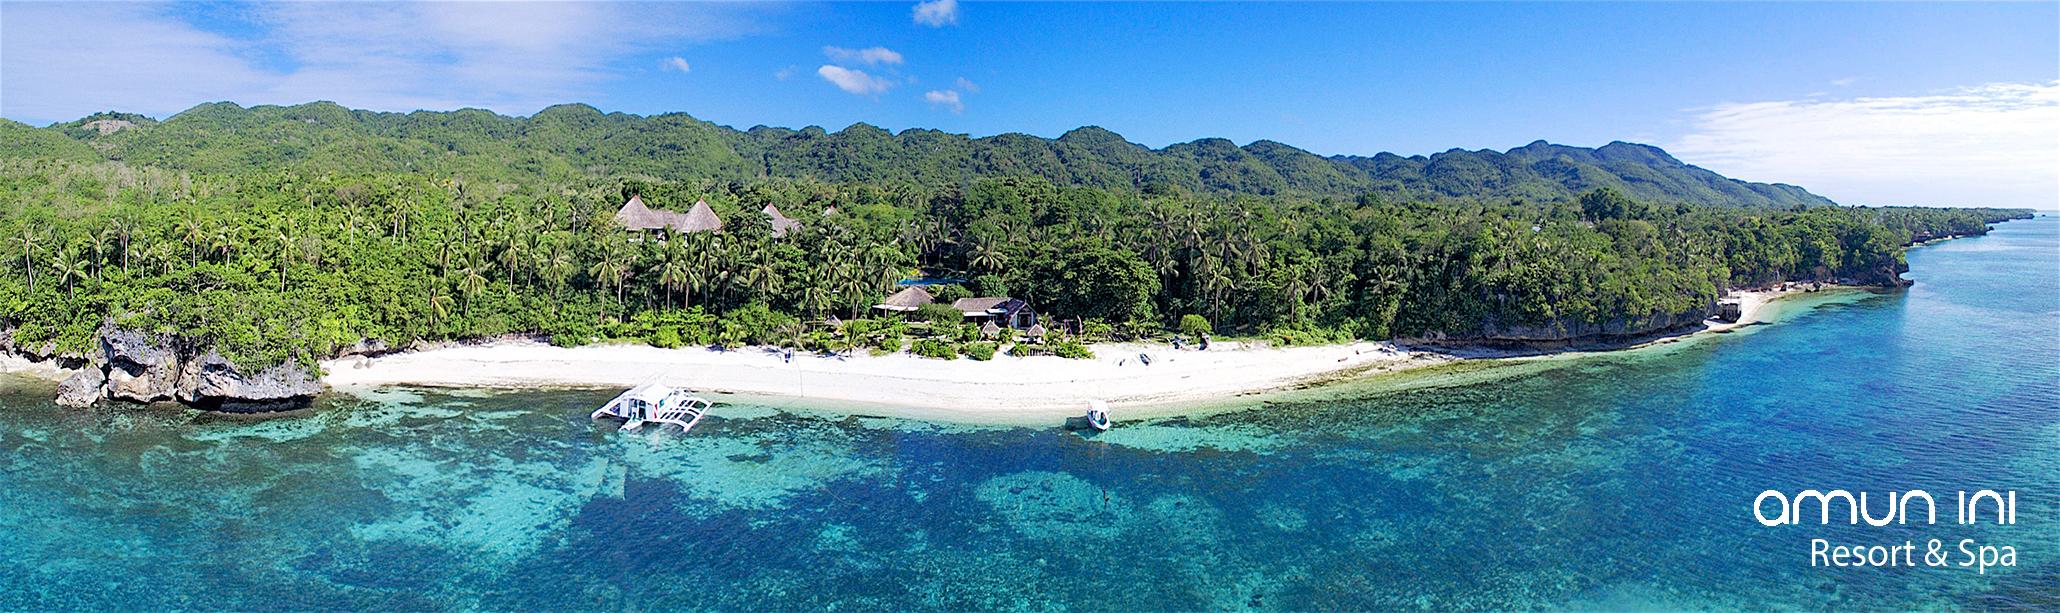 Amun Ini Beach Resort & Spa - Luftaufnahme